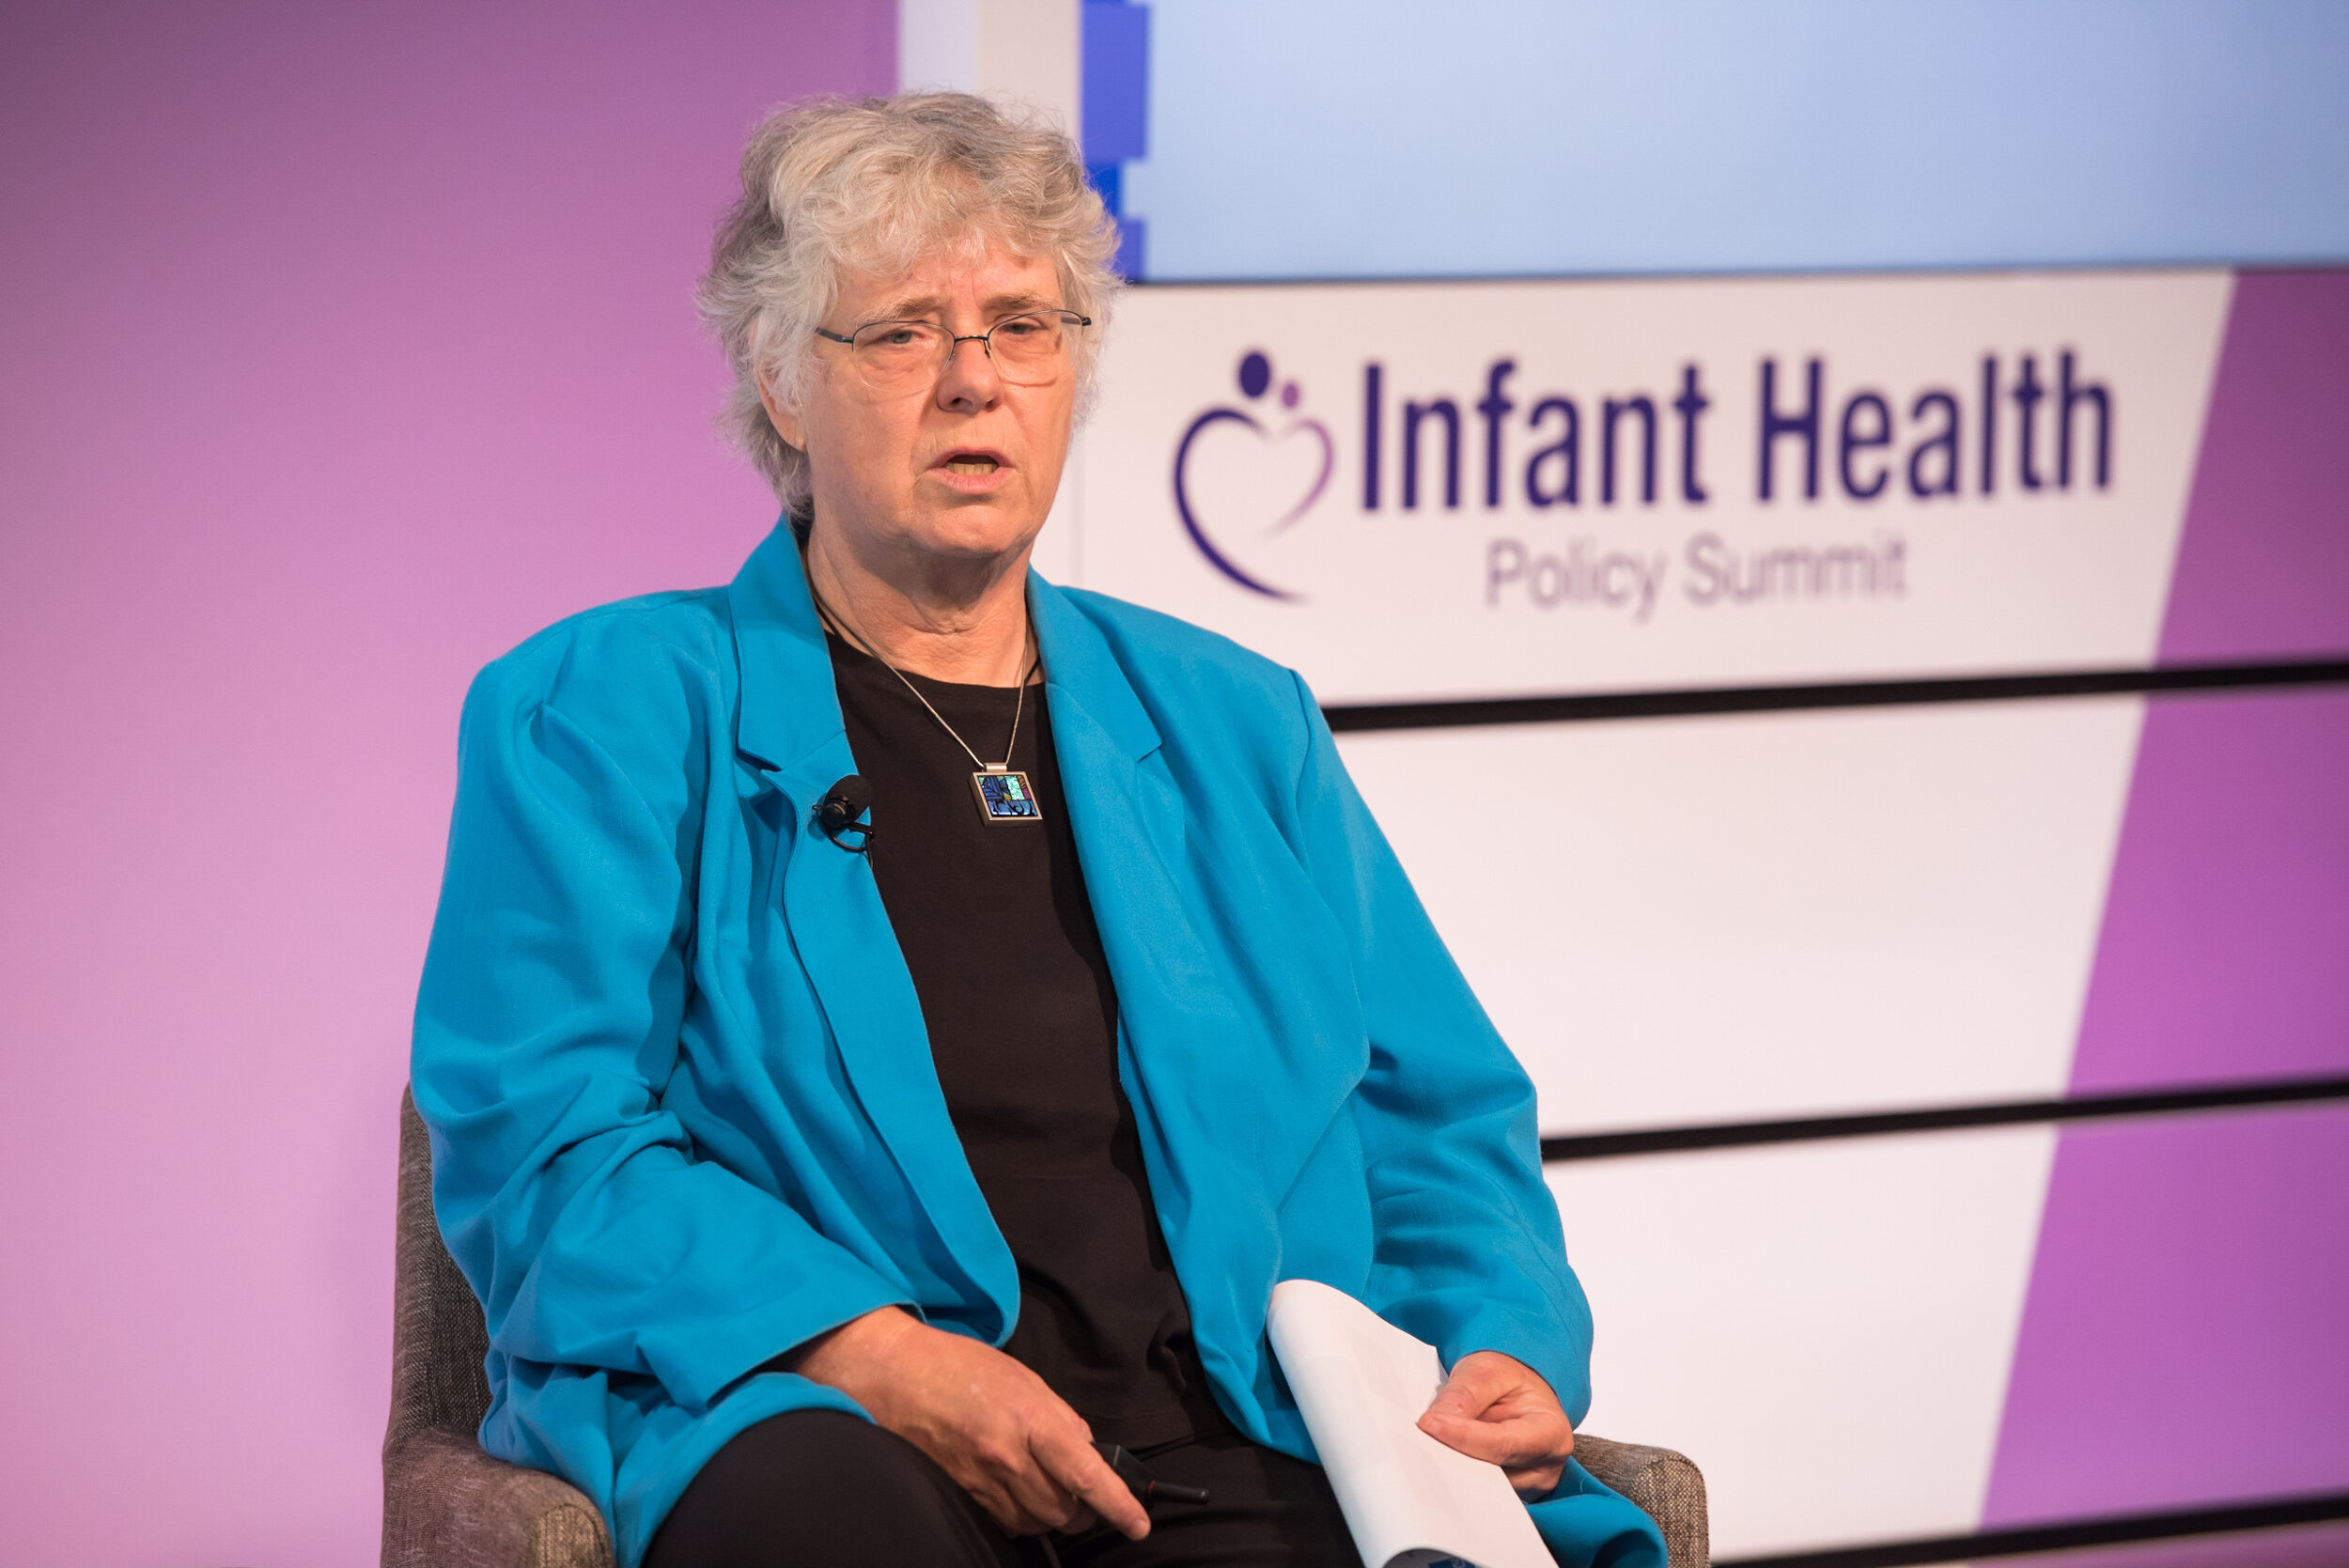 AfPA Infant Health Summit - Jason Dixson Photography - 190912 - 091724 - 0362.jpg